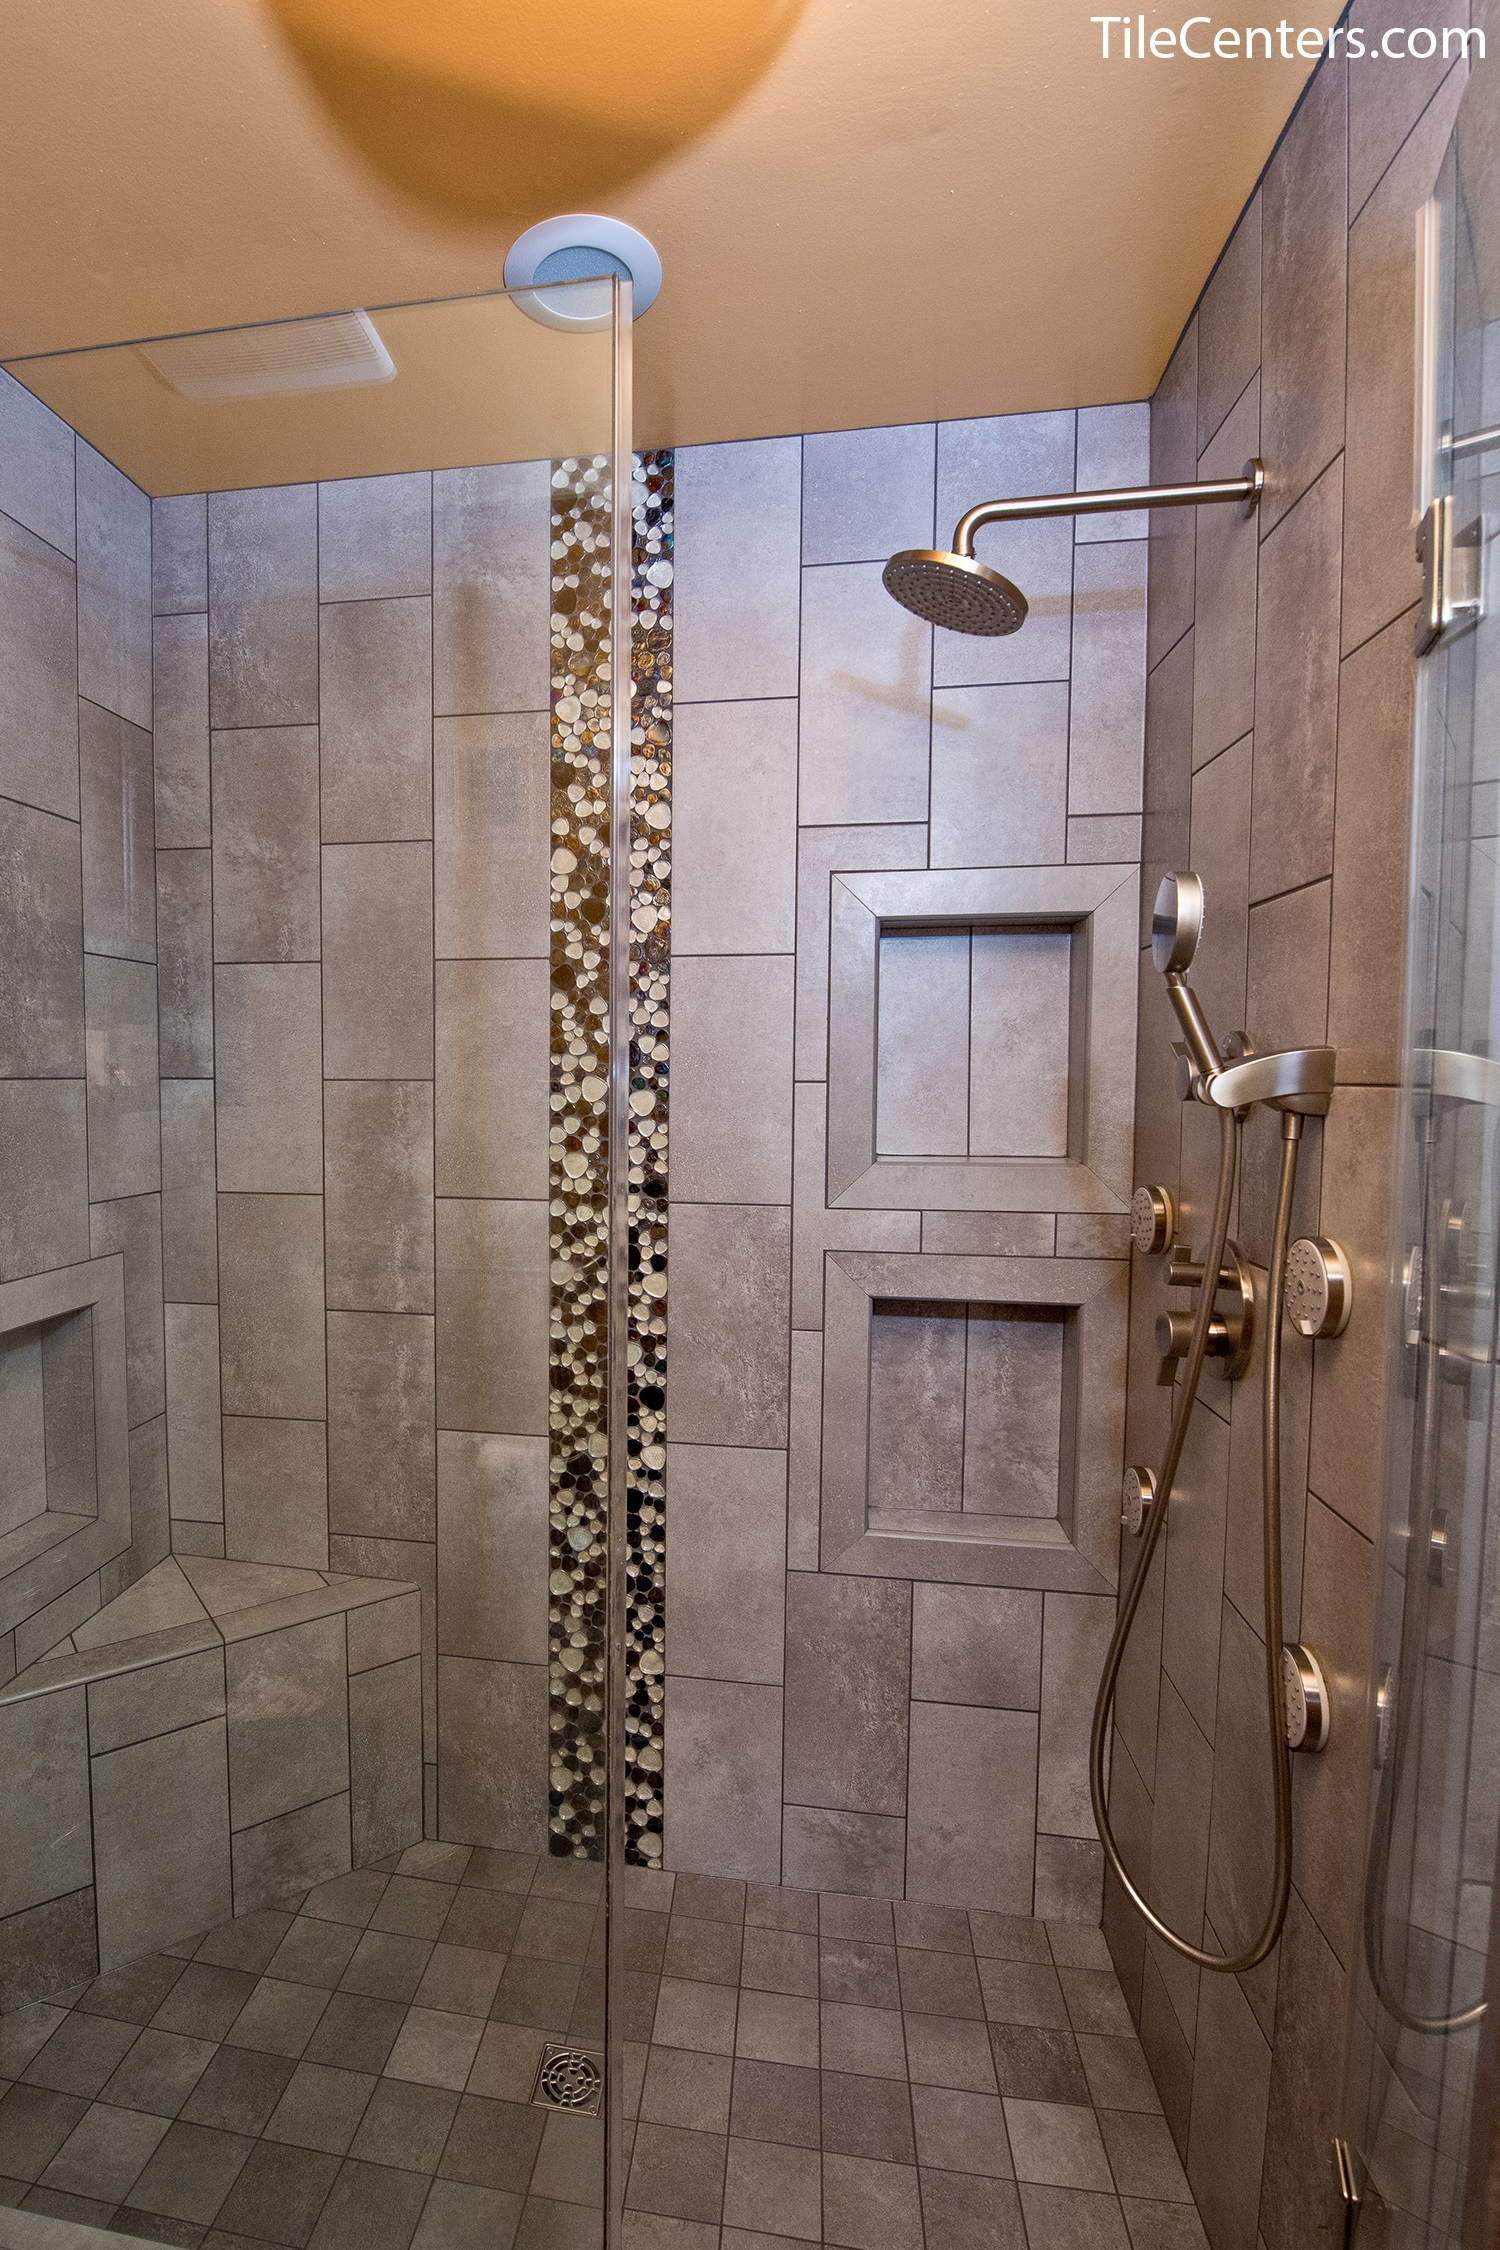 Bathroom Bluet Ln Silver Spring MD Tile Center - Bathroom remodeling silver spring md